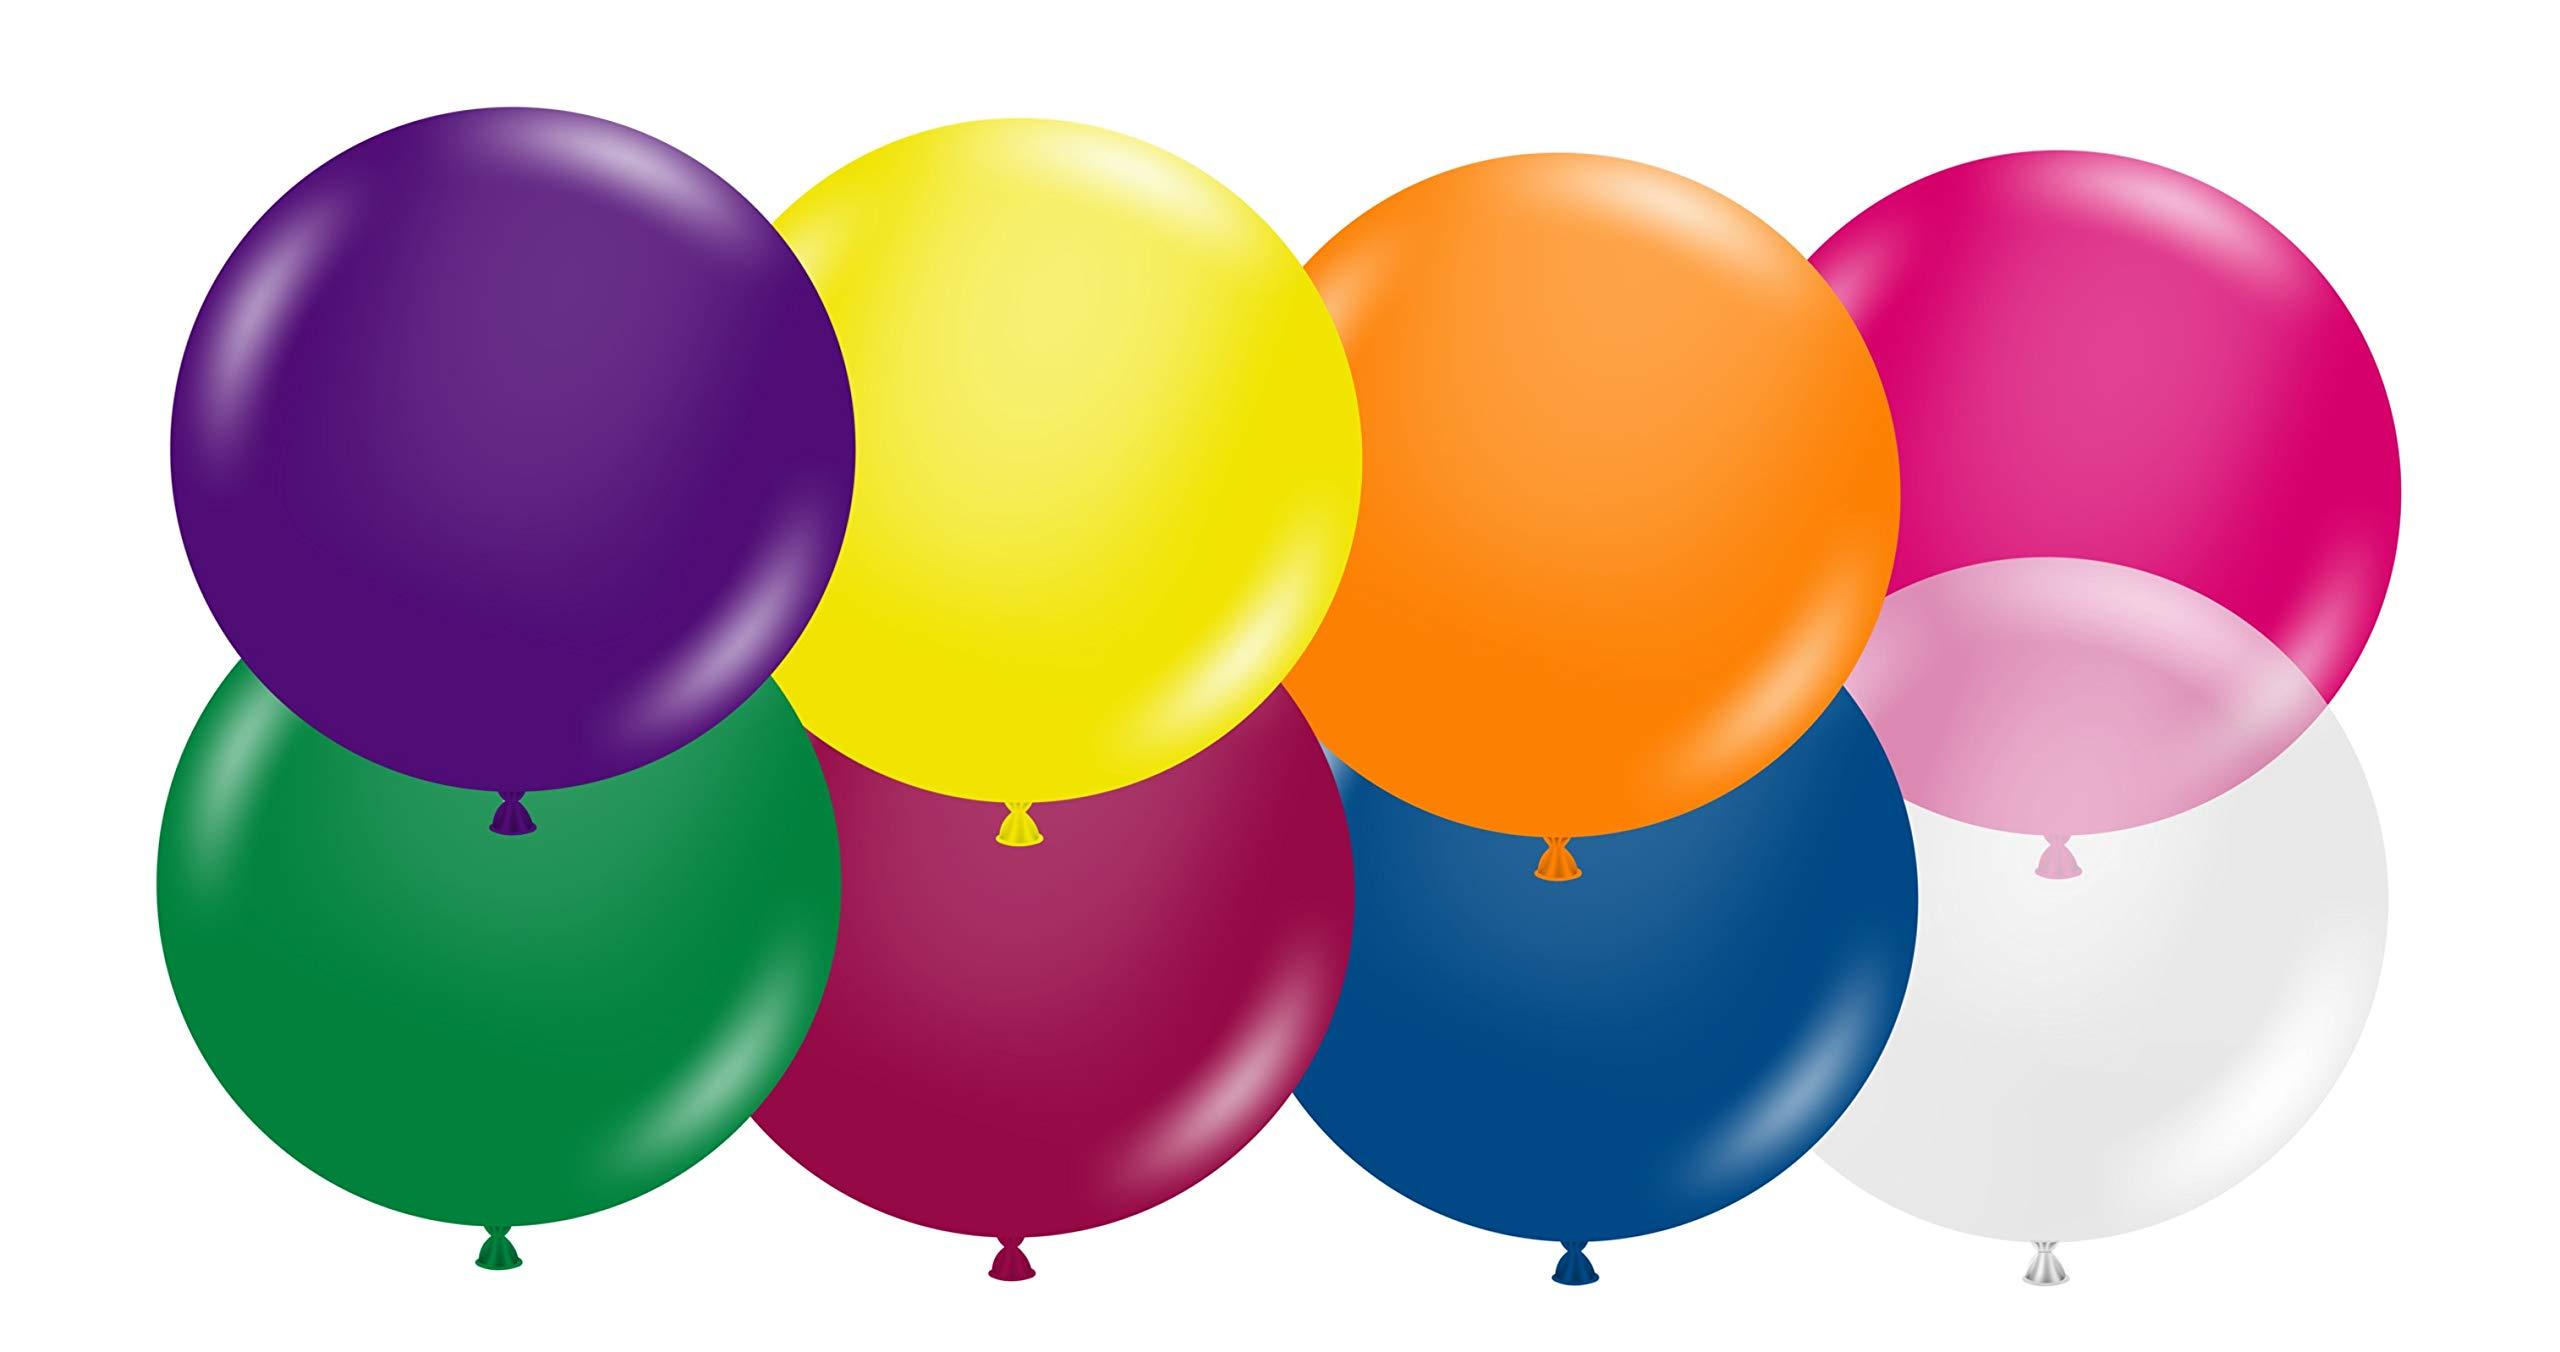 Tuftex 24 Inch Crystal Assortment Latex Balloons (Premium Helium Quality) Pkg of 10